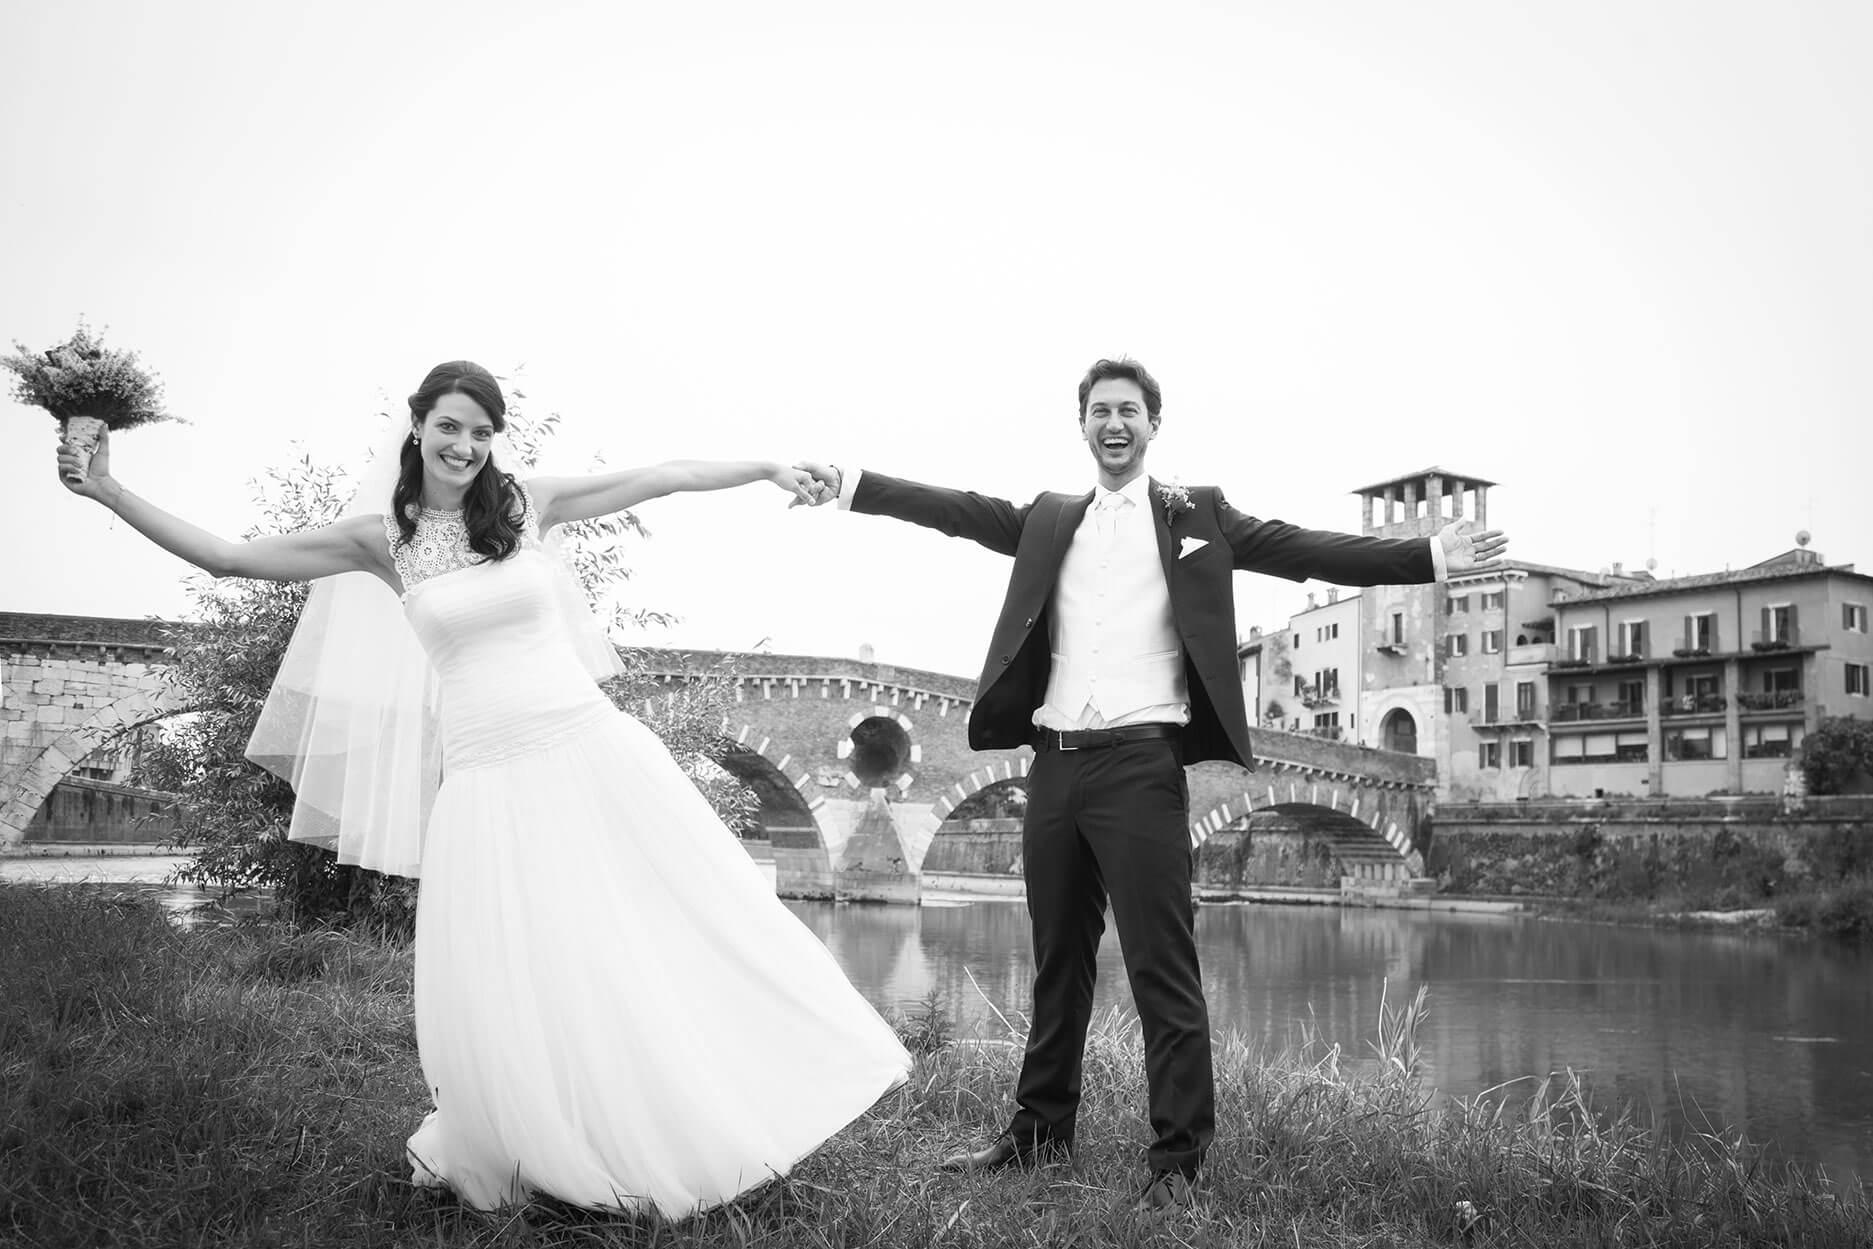 Francesca-Ferrati-WeddingIMG_0962